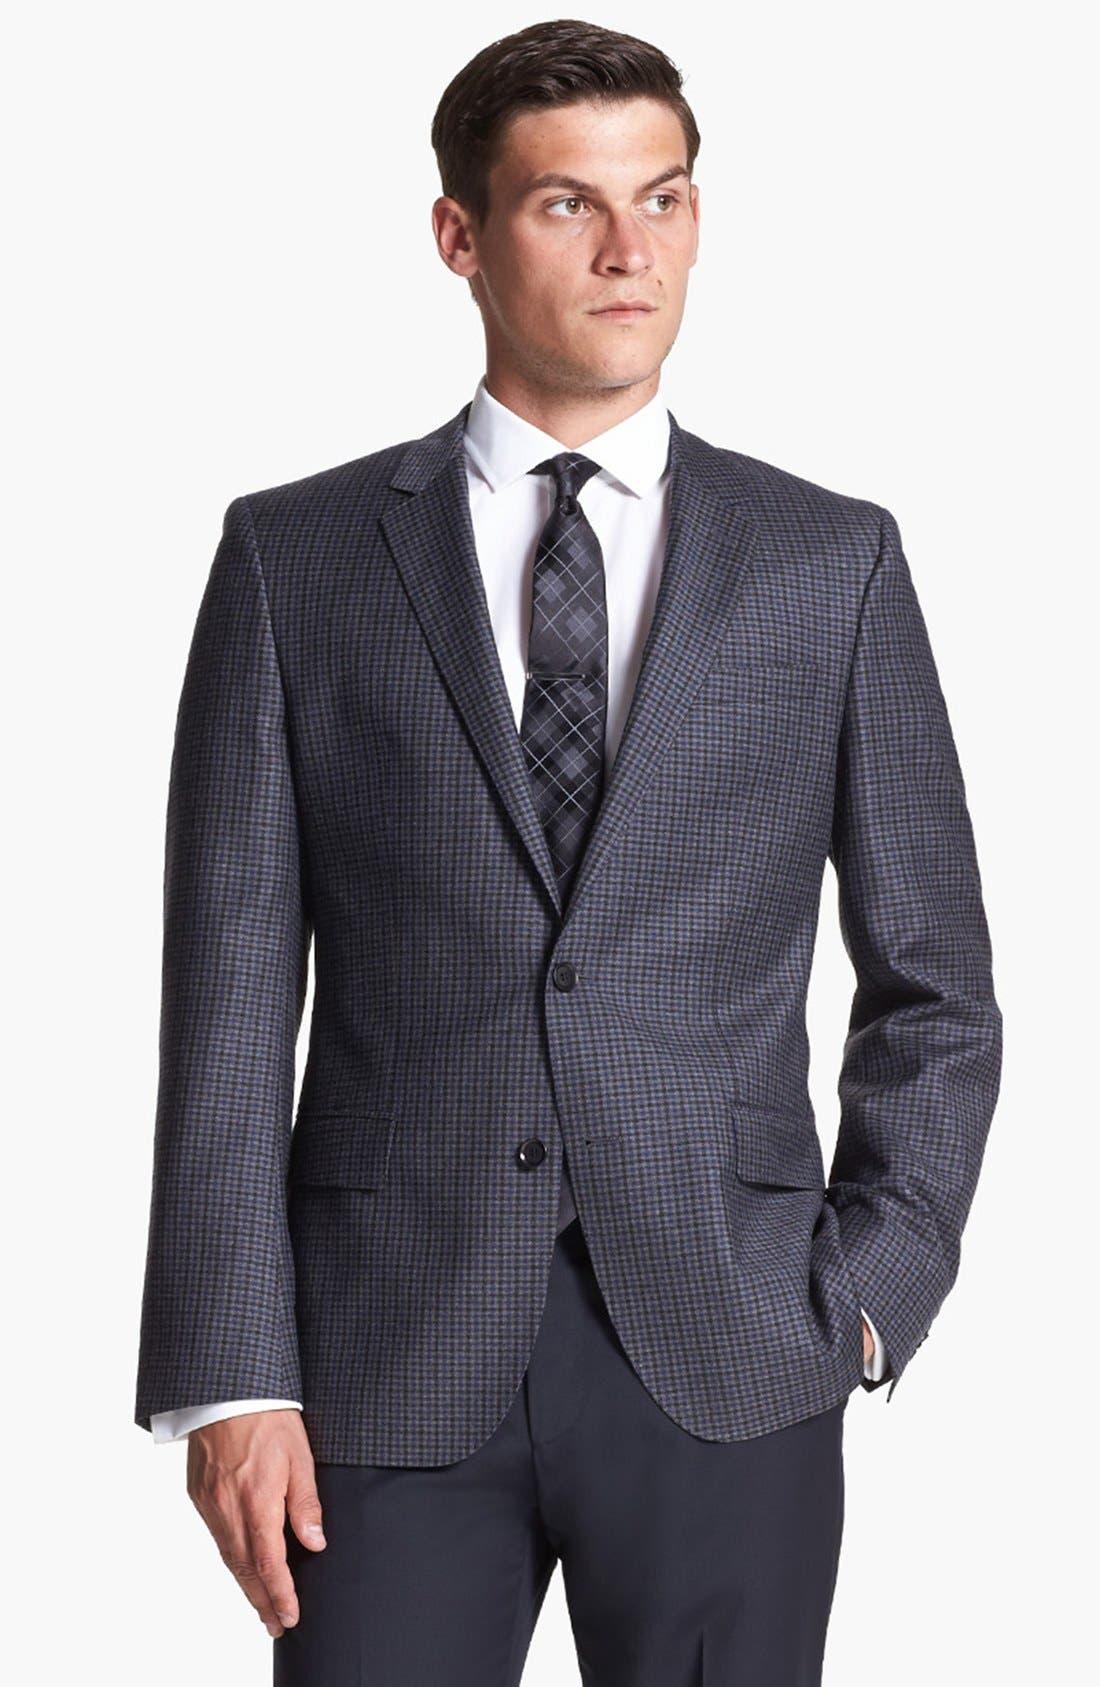 Alternate Image 1 Selected - BOSS HUGO BOSS 'Hutch' Trim Fit Check Sportcoat